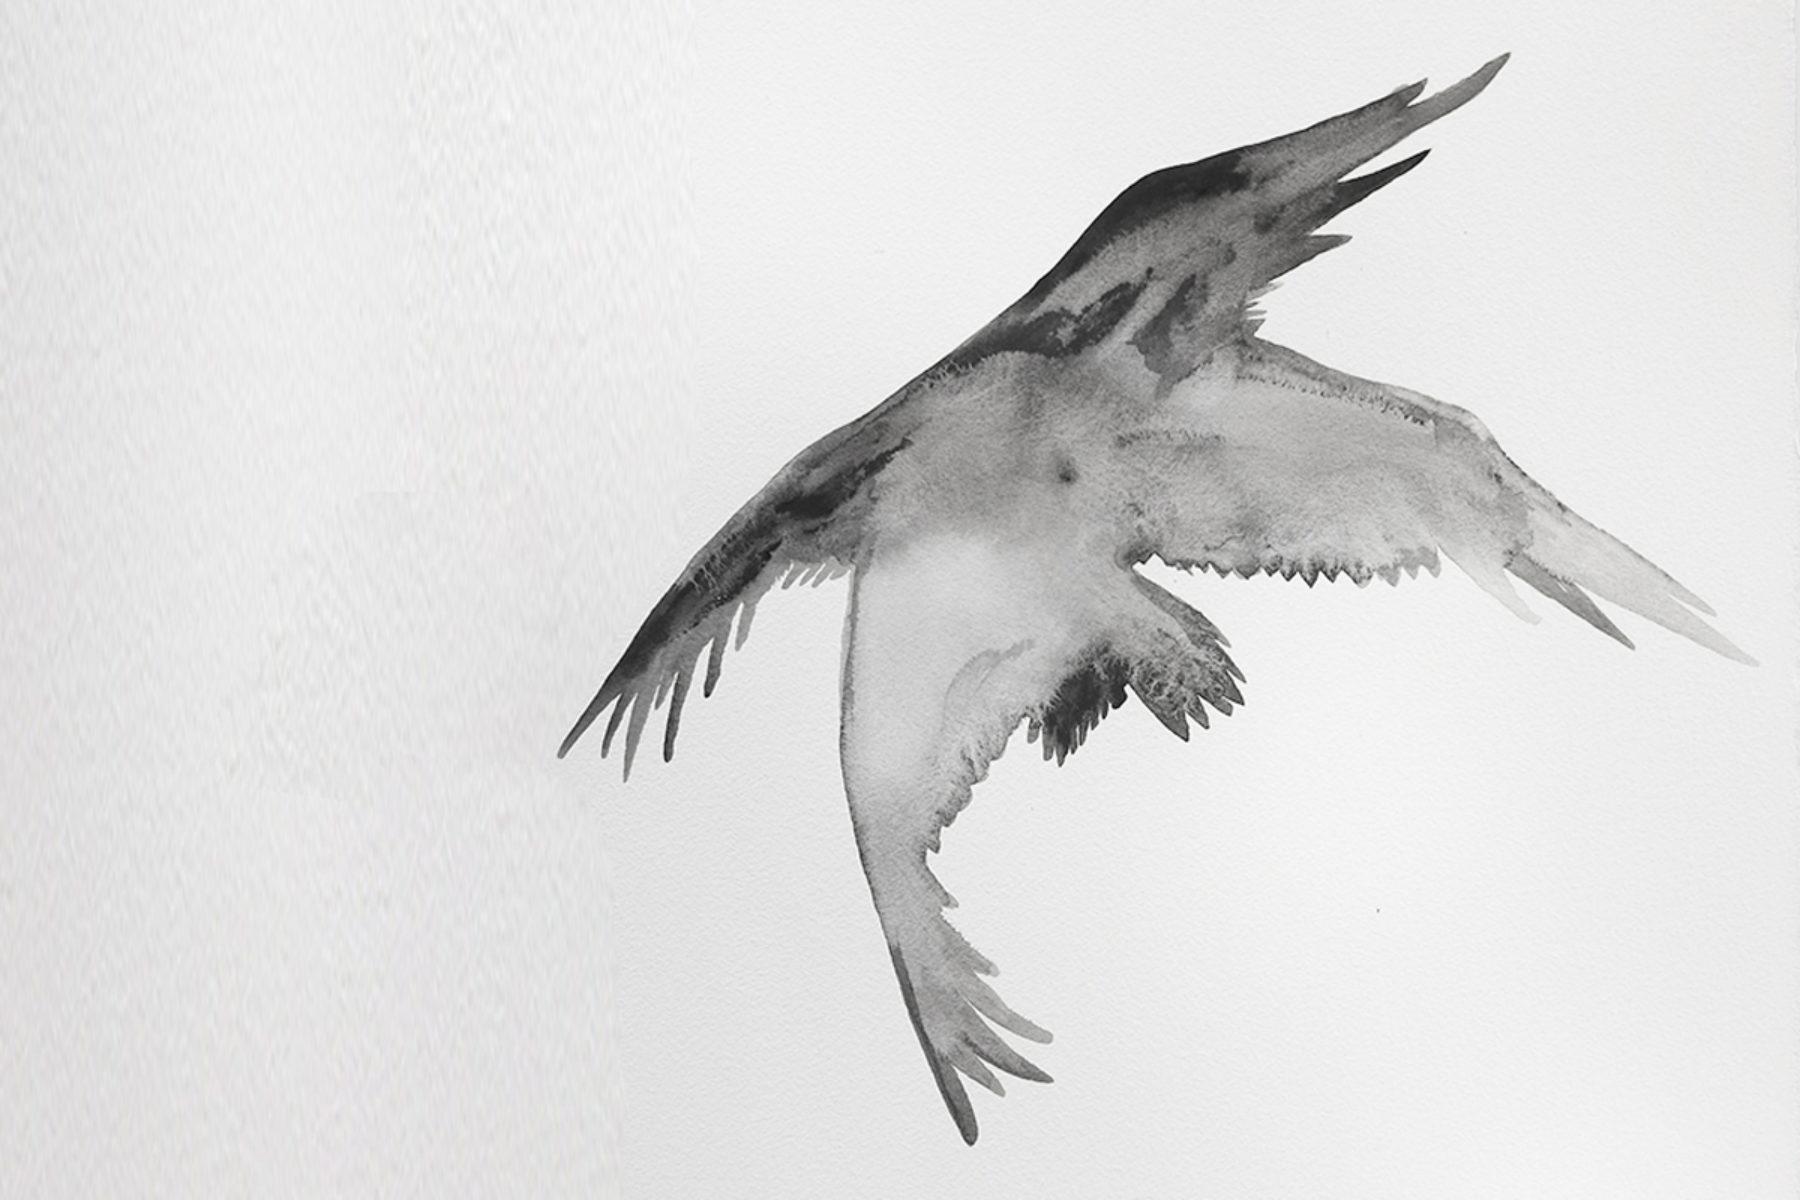 F. Lanaro, An eagle has not flag, 2013, acrylic on paper, 70 x 50 cm